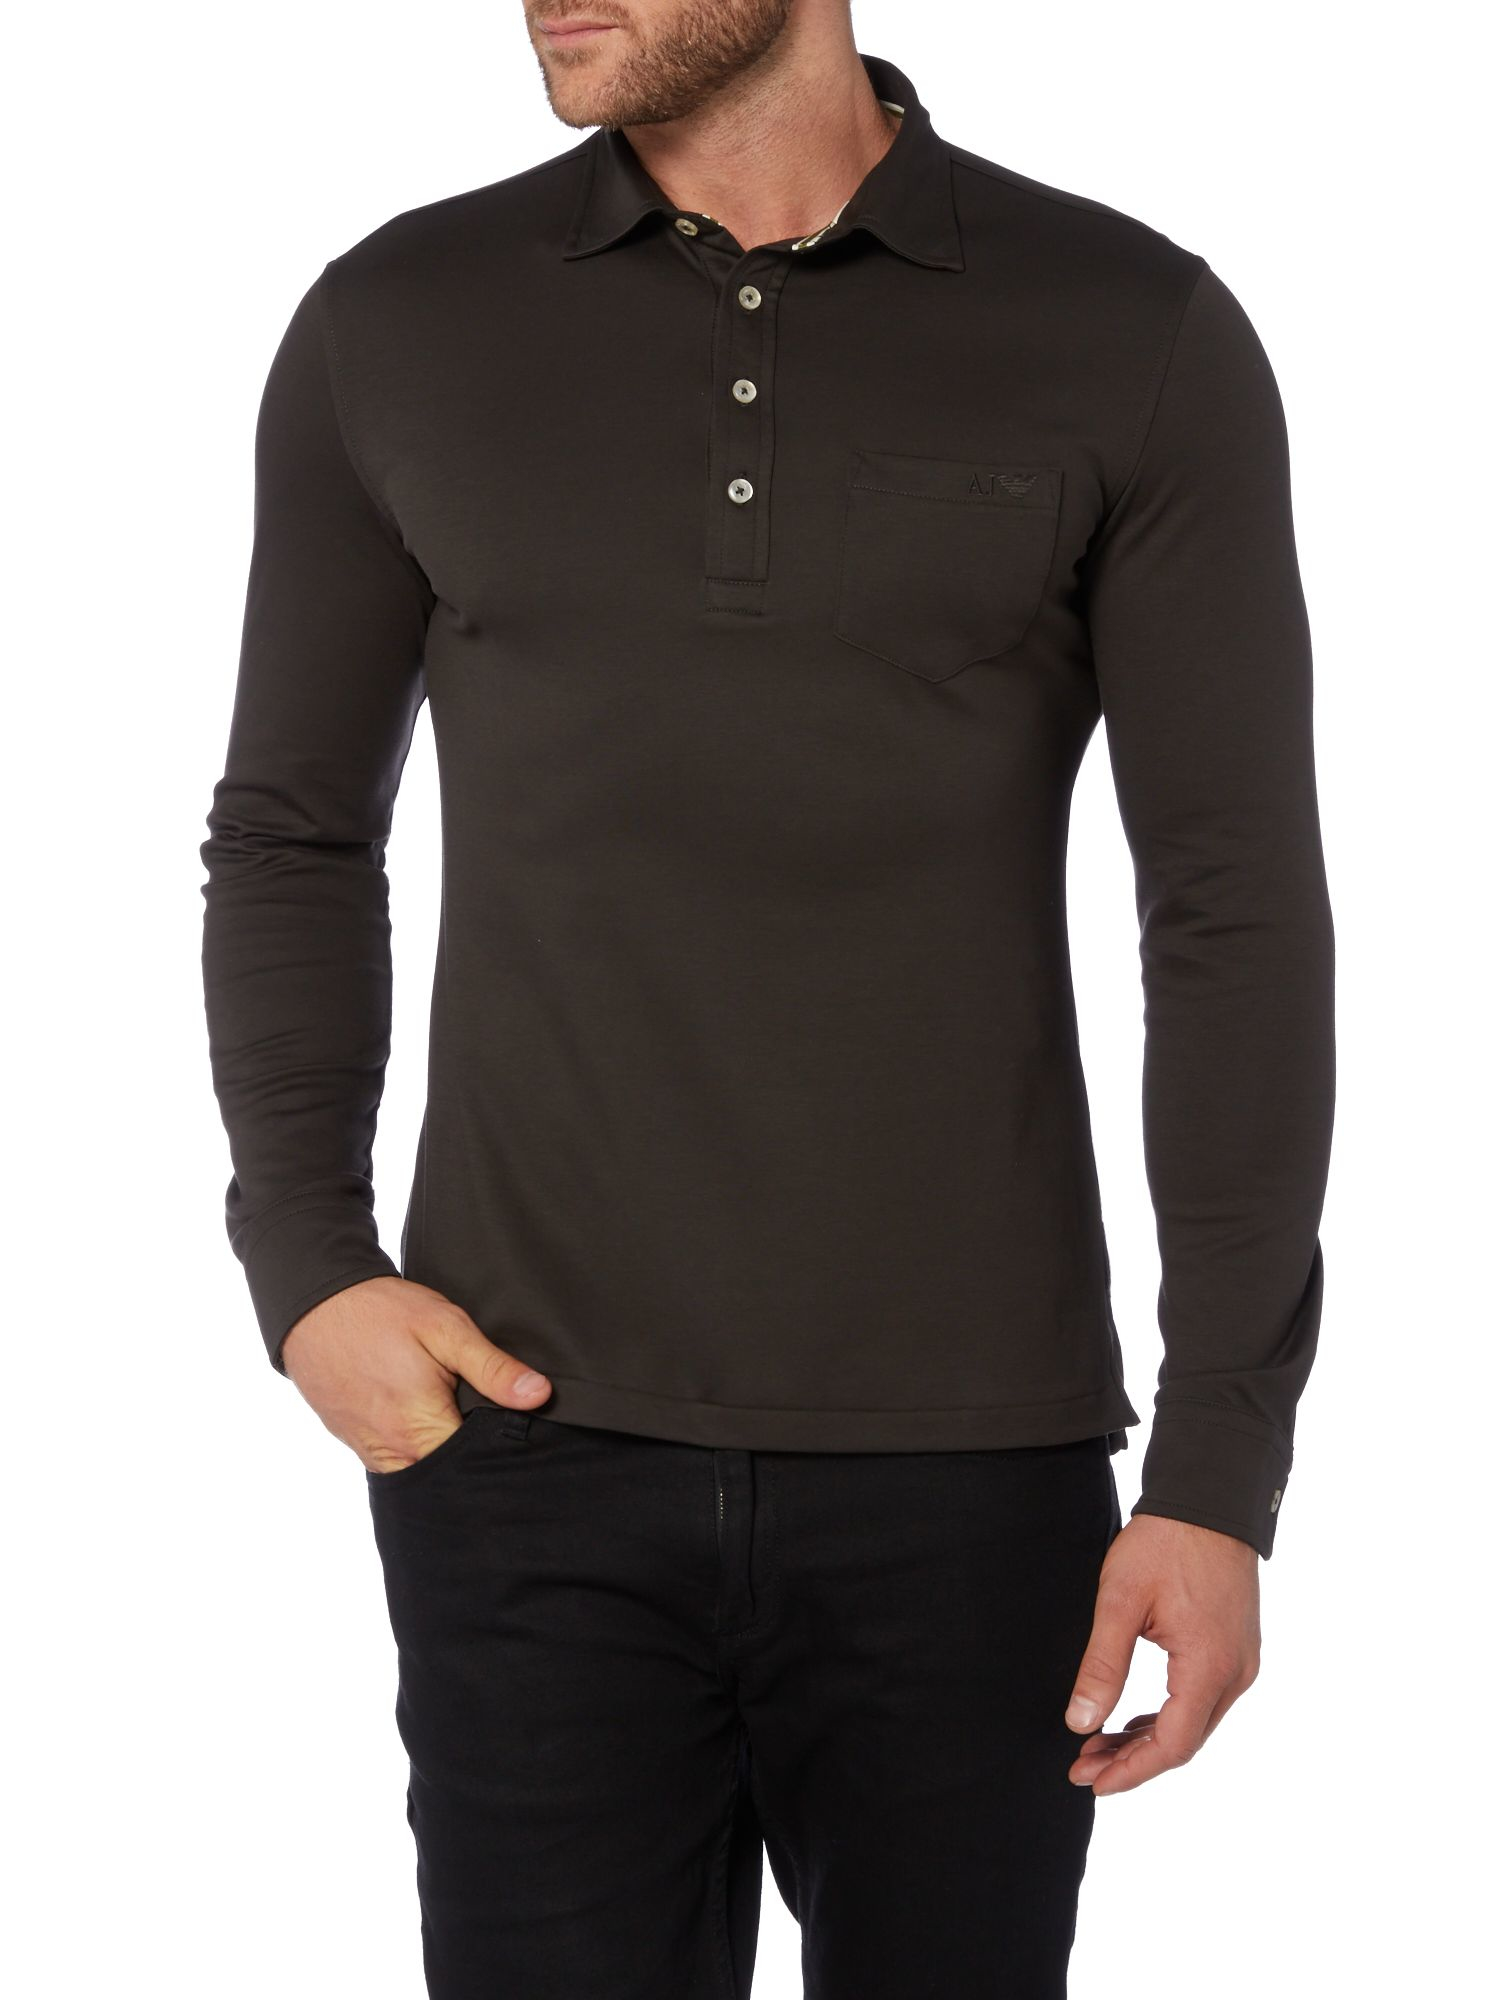 ec699c79db Armani jeans Slim Fit Long Sleeve Pocket Polo Shirt in Black for Men Lyst